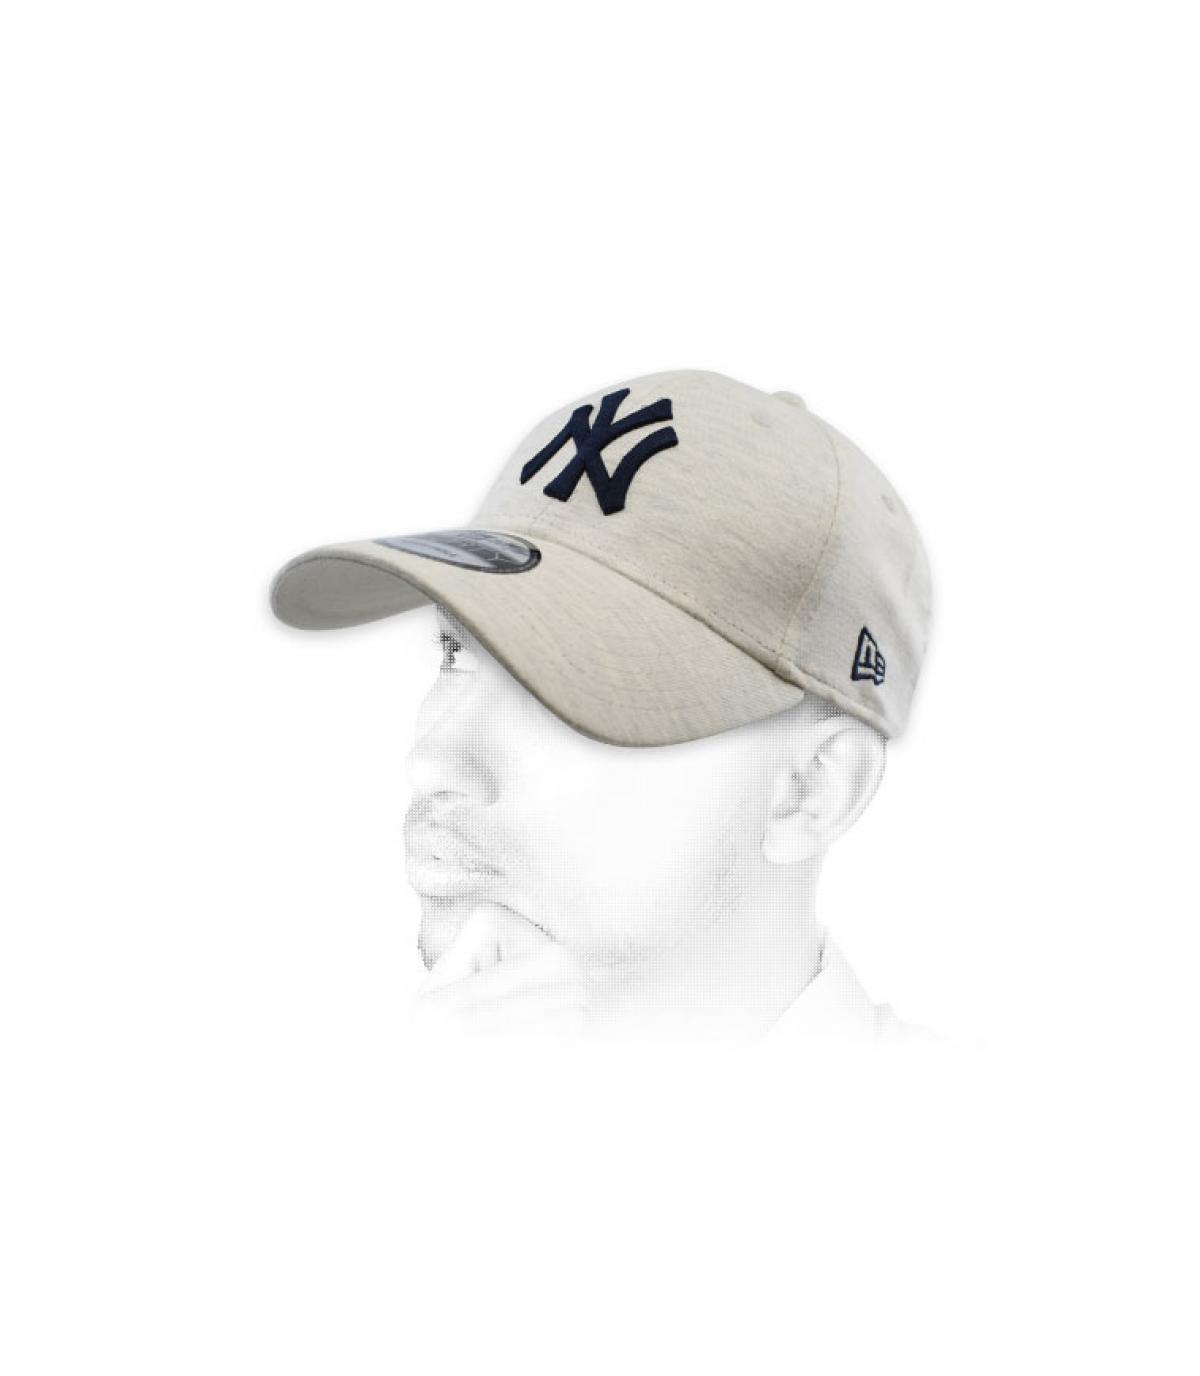 gorra NY gris azul